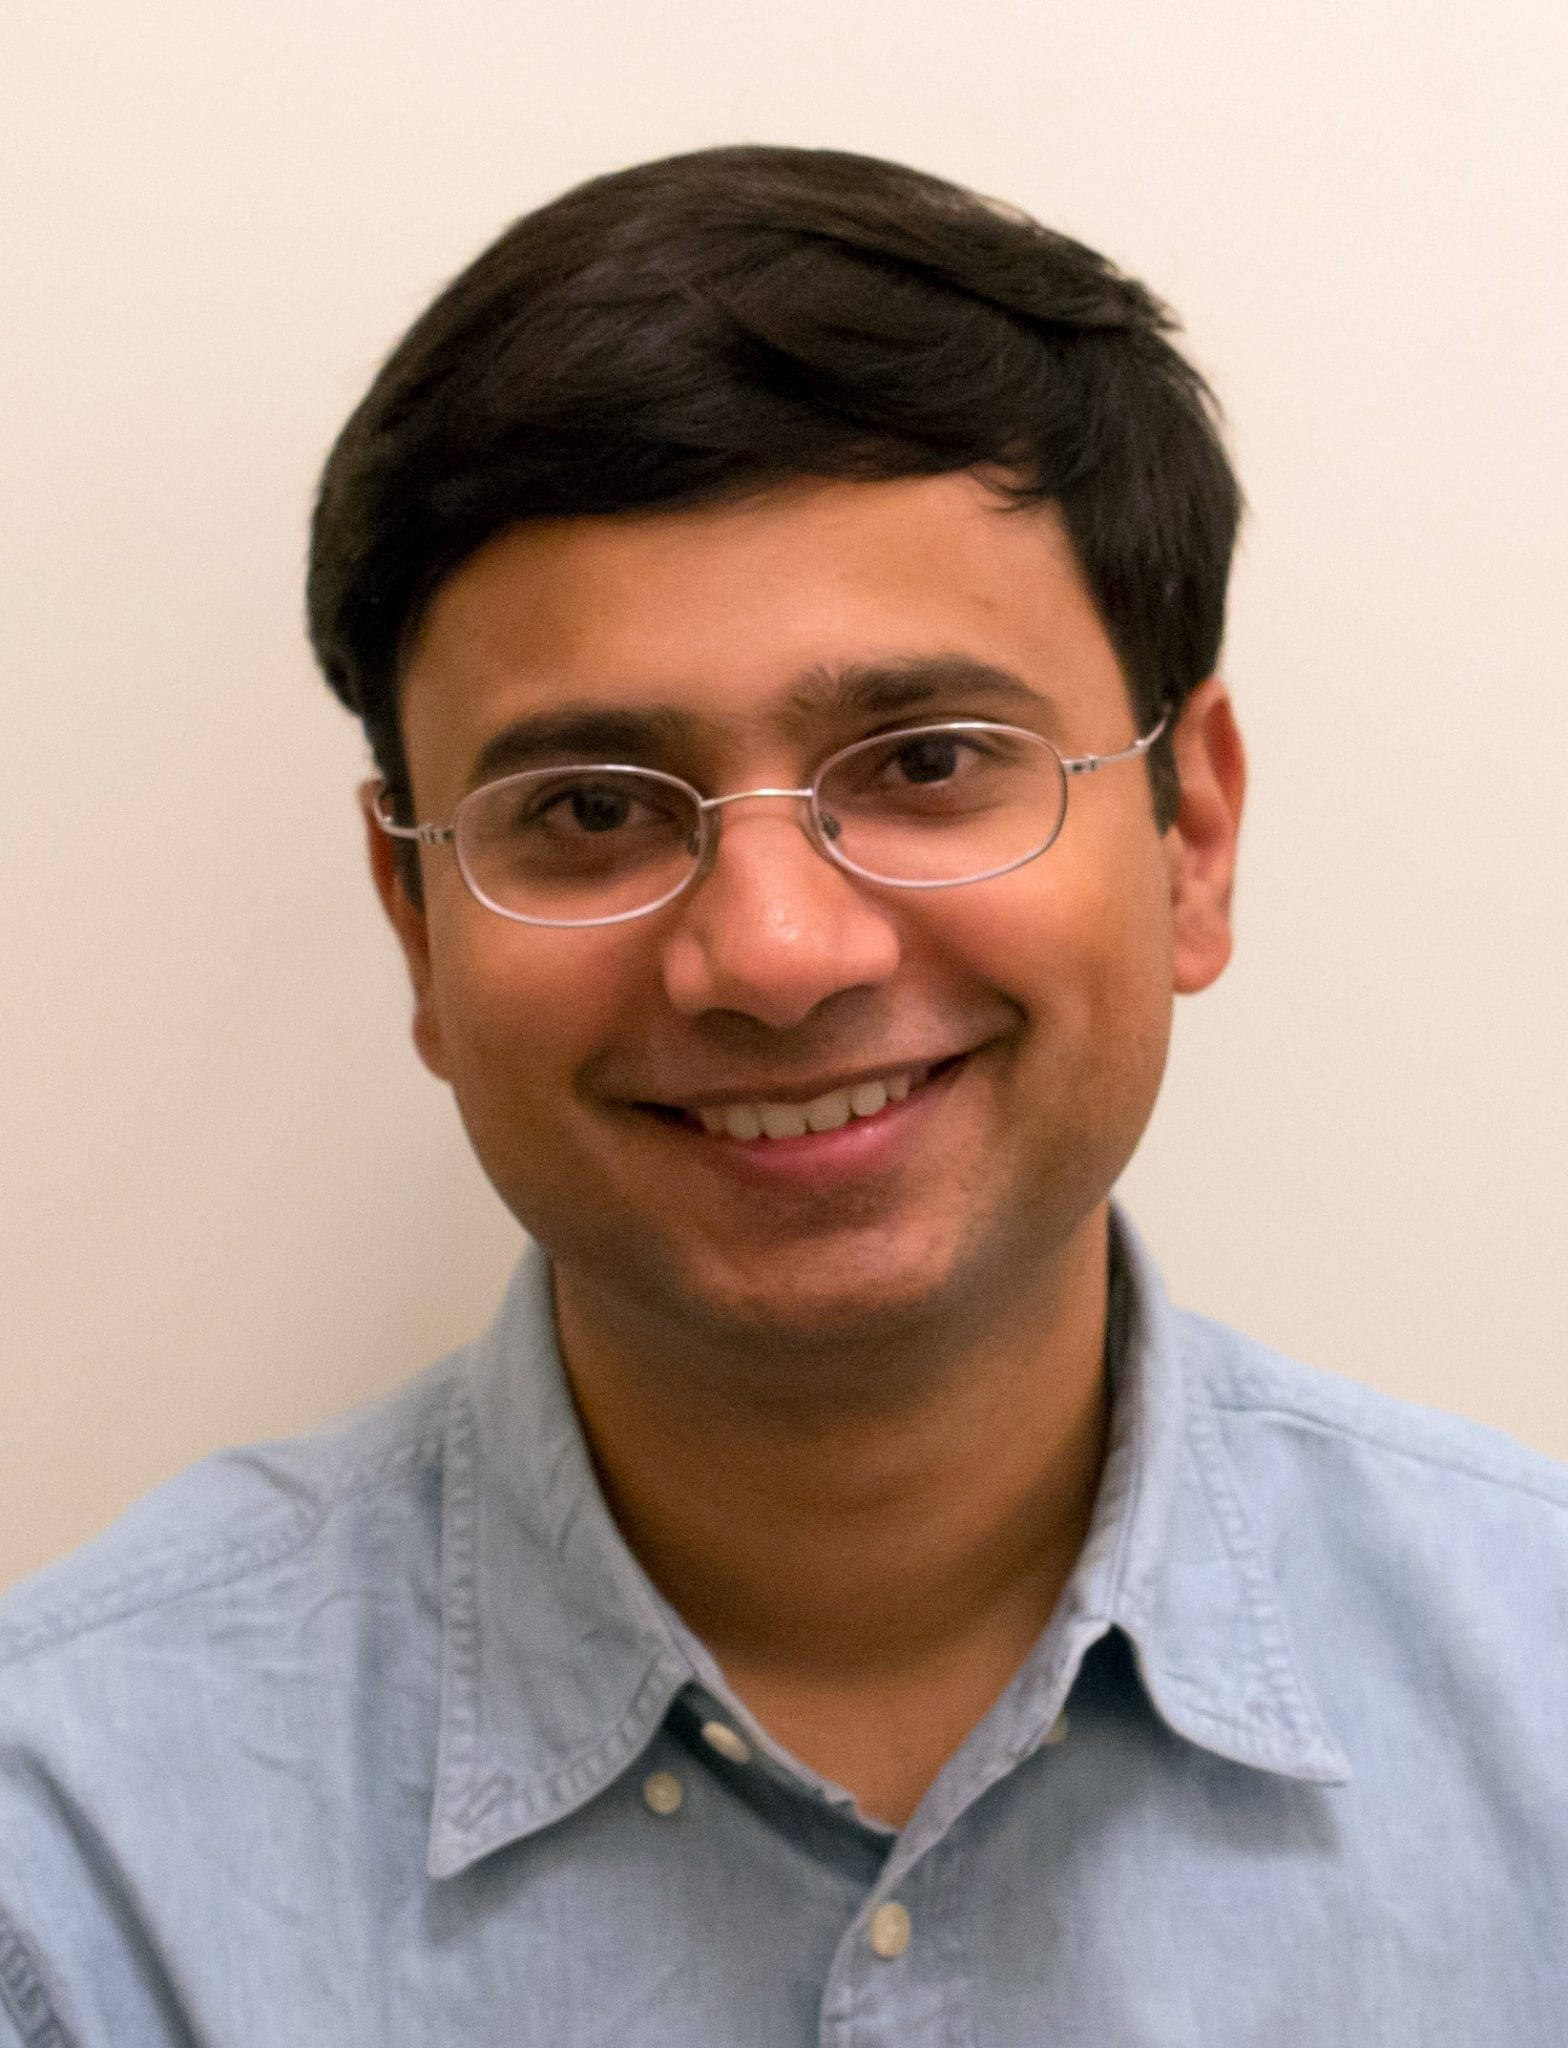 Interview - Joydeep Sen Sarma, Co-Founder and Head at Qubole India